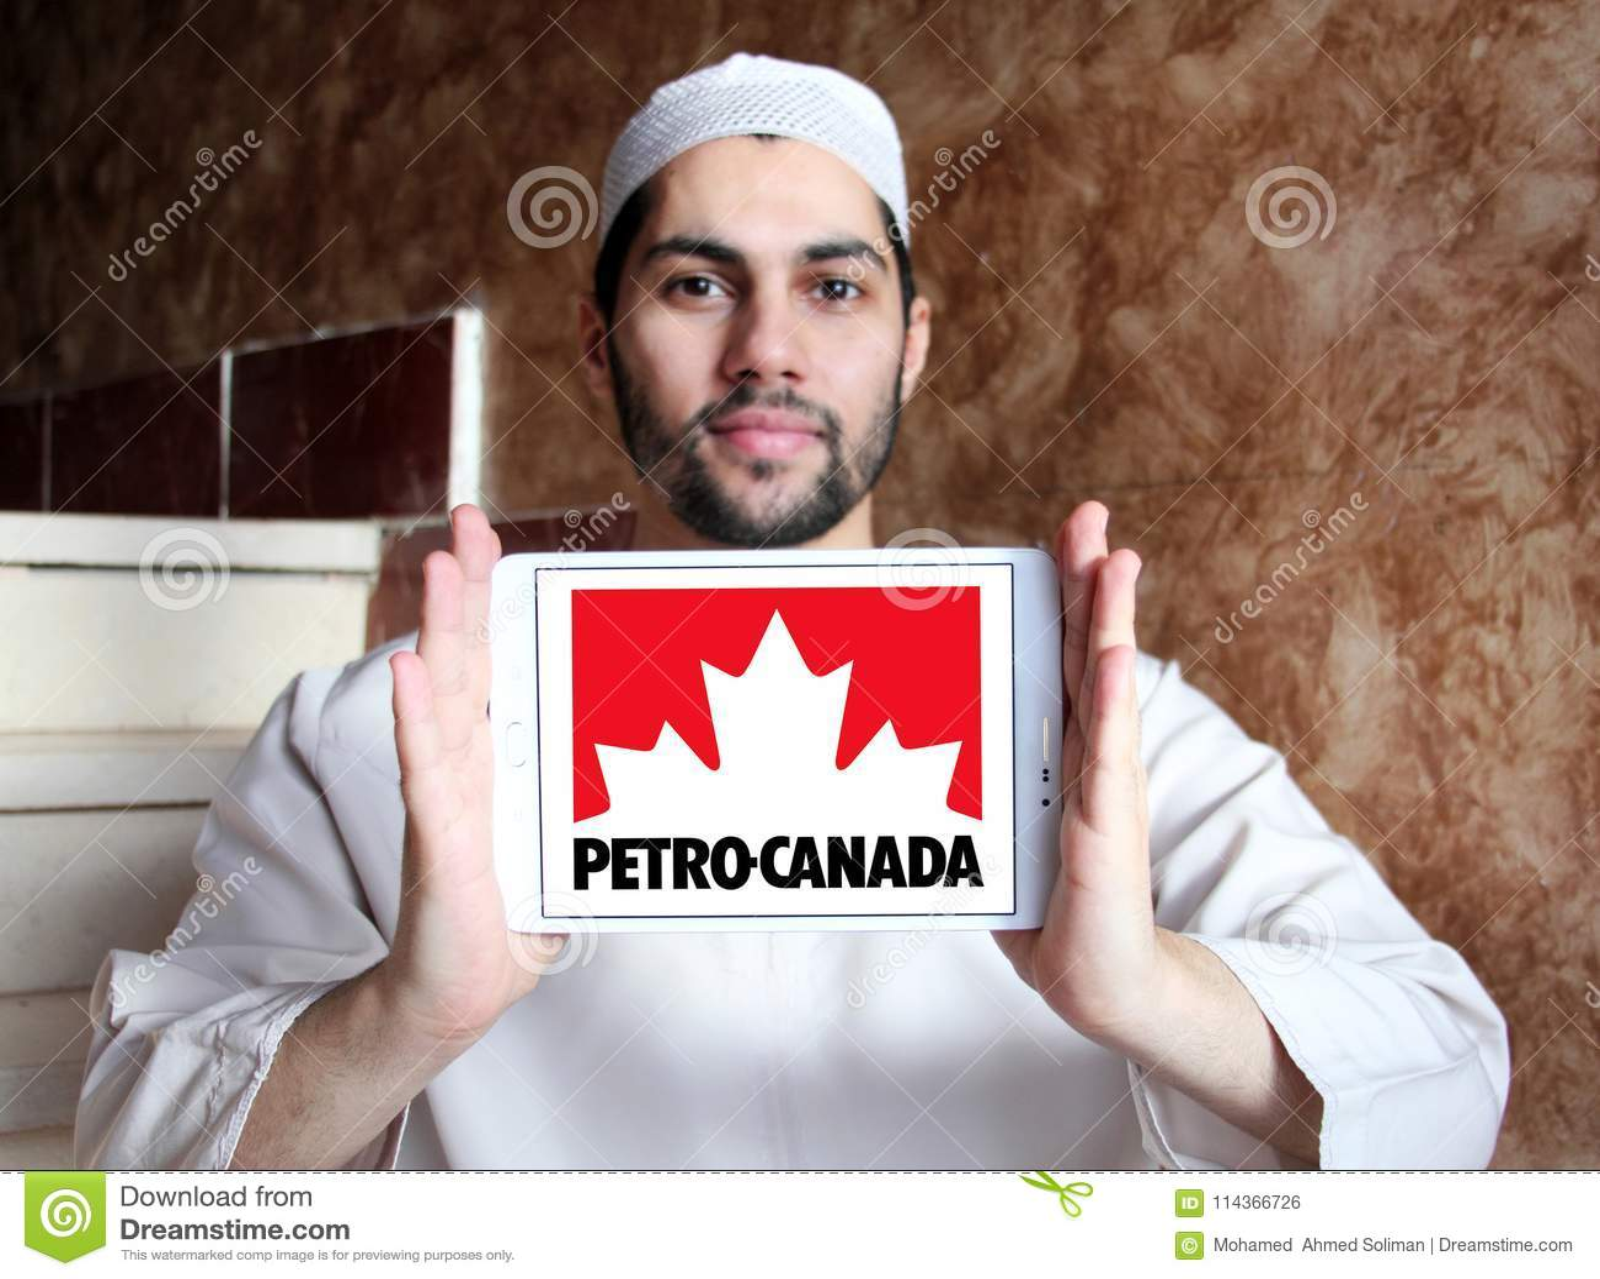 Petro Canada company logo editorial photo  Image of sign